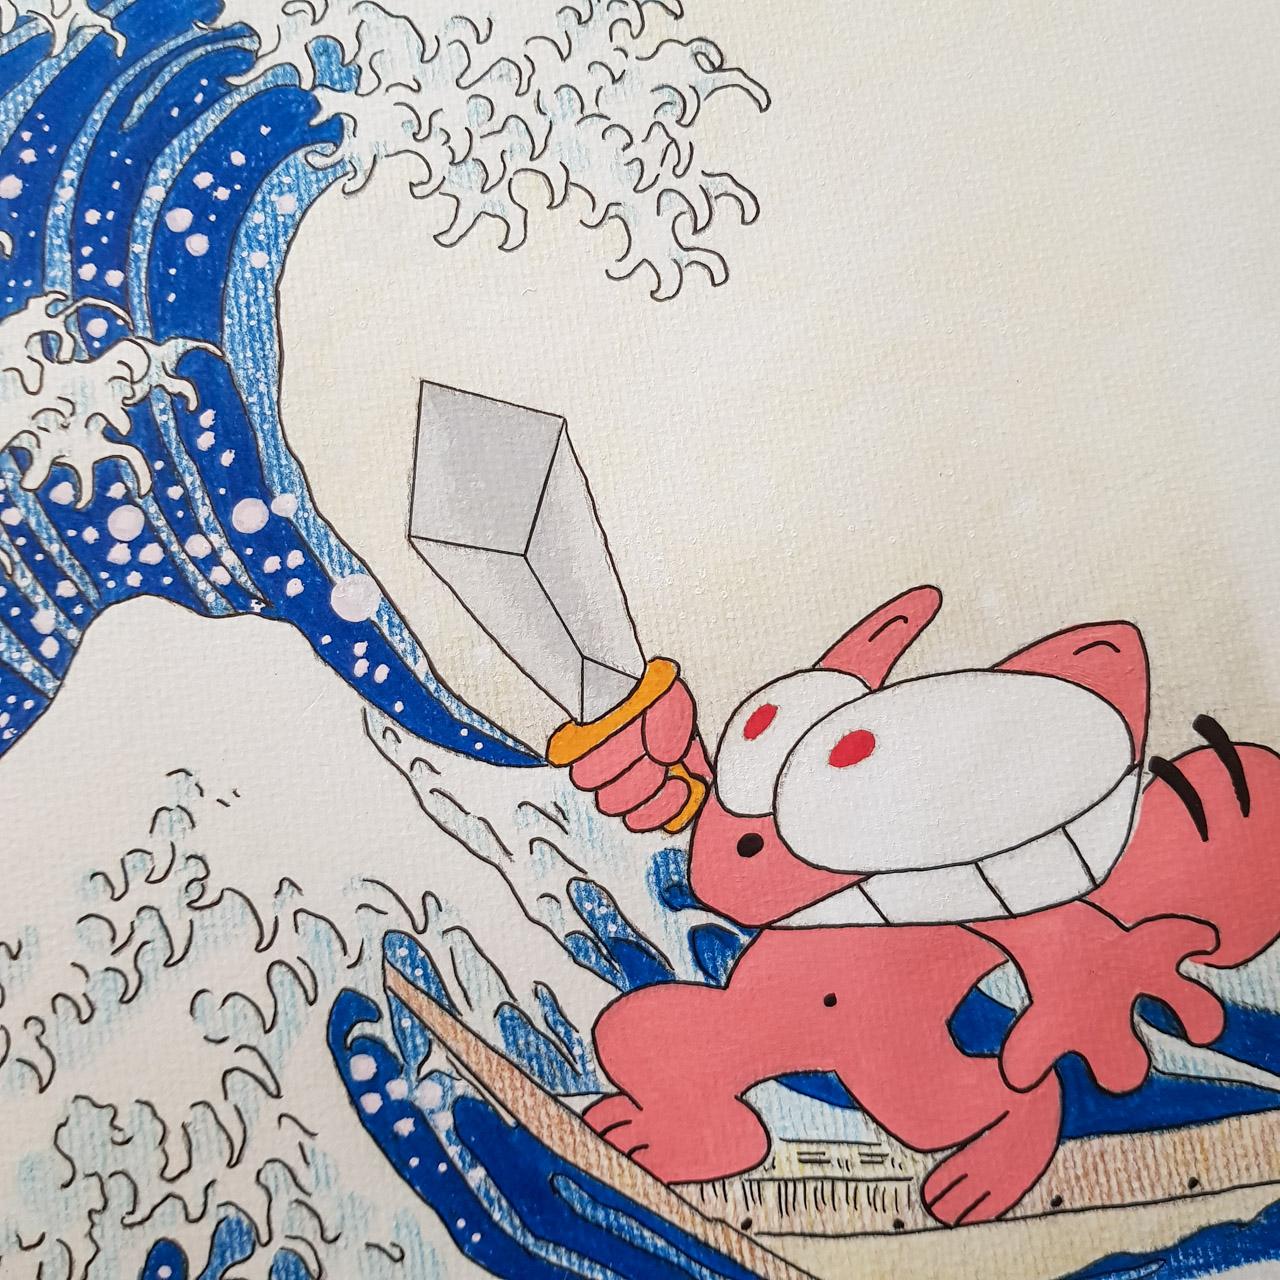 dessin-la-grande-vague-de-kanagawa